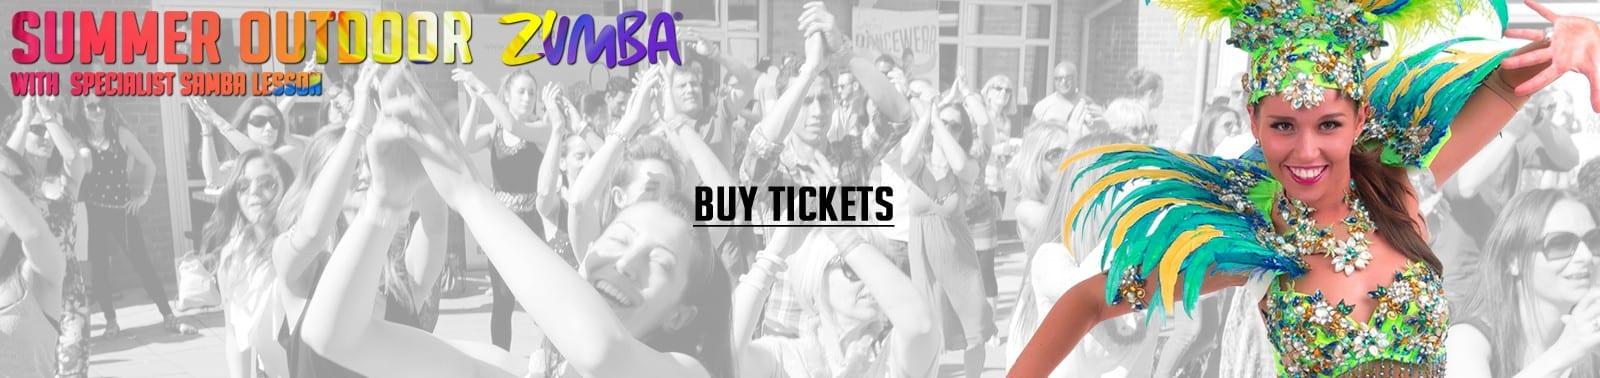 zumba, outdoor zumba, zumba classes, samba